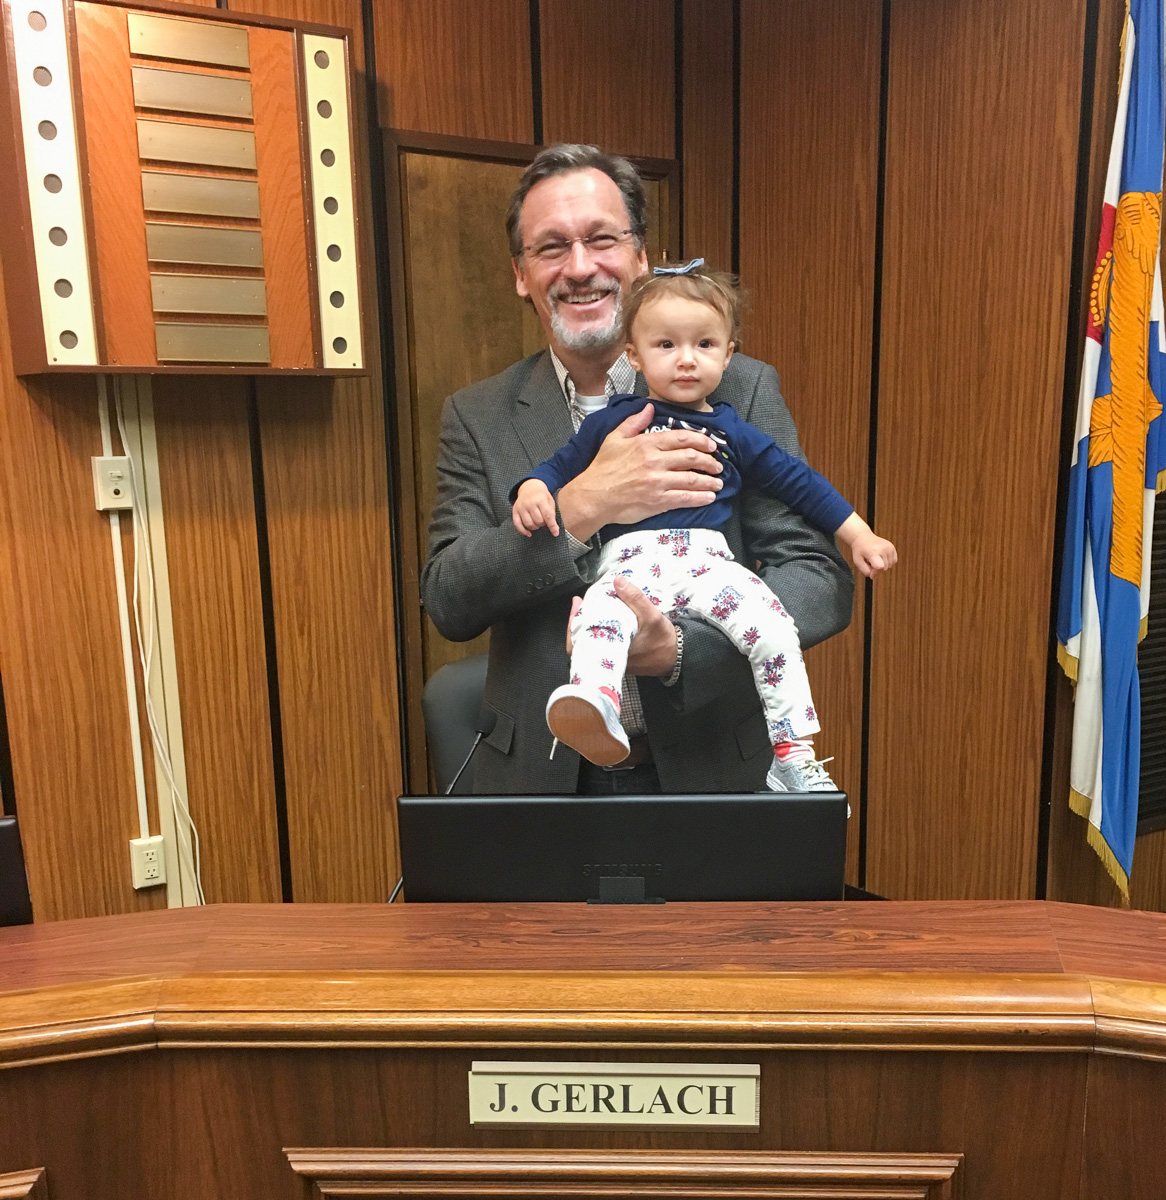 Jon Gerlach with Grand Daughter Samarah at Architectural Review Board in Fredericksburg VA